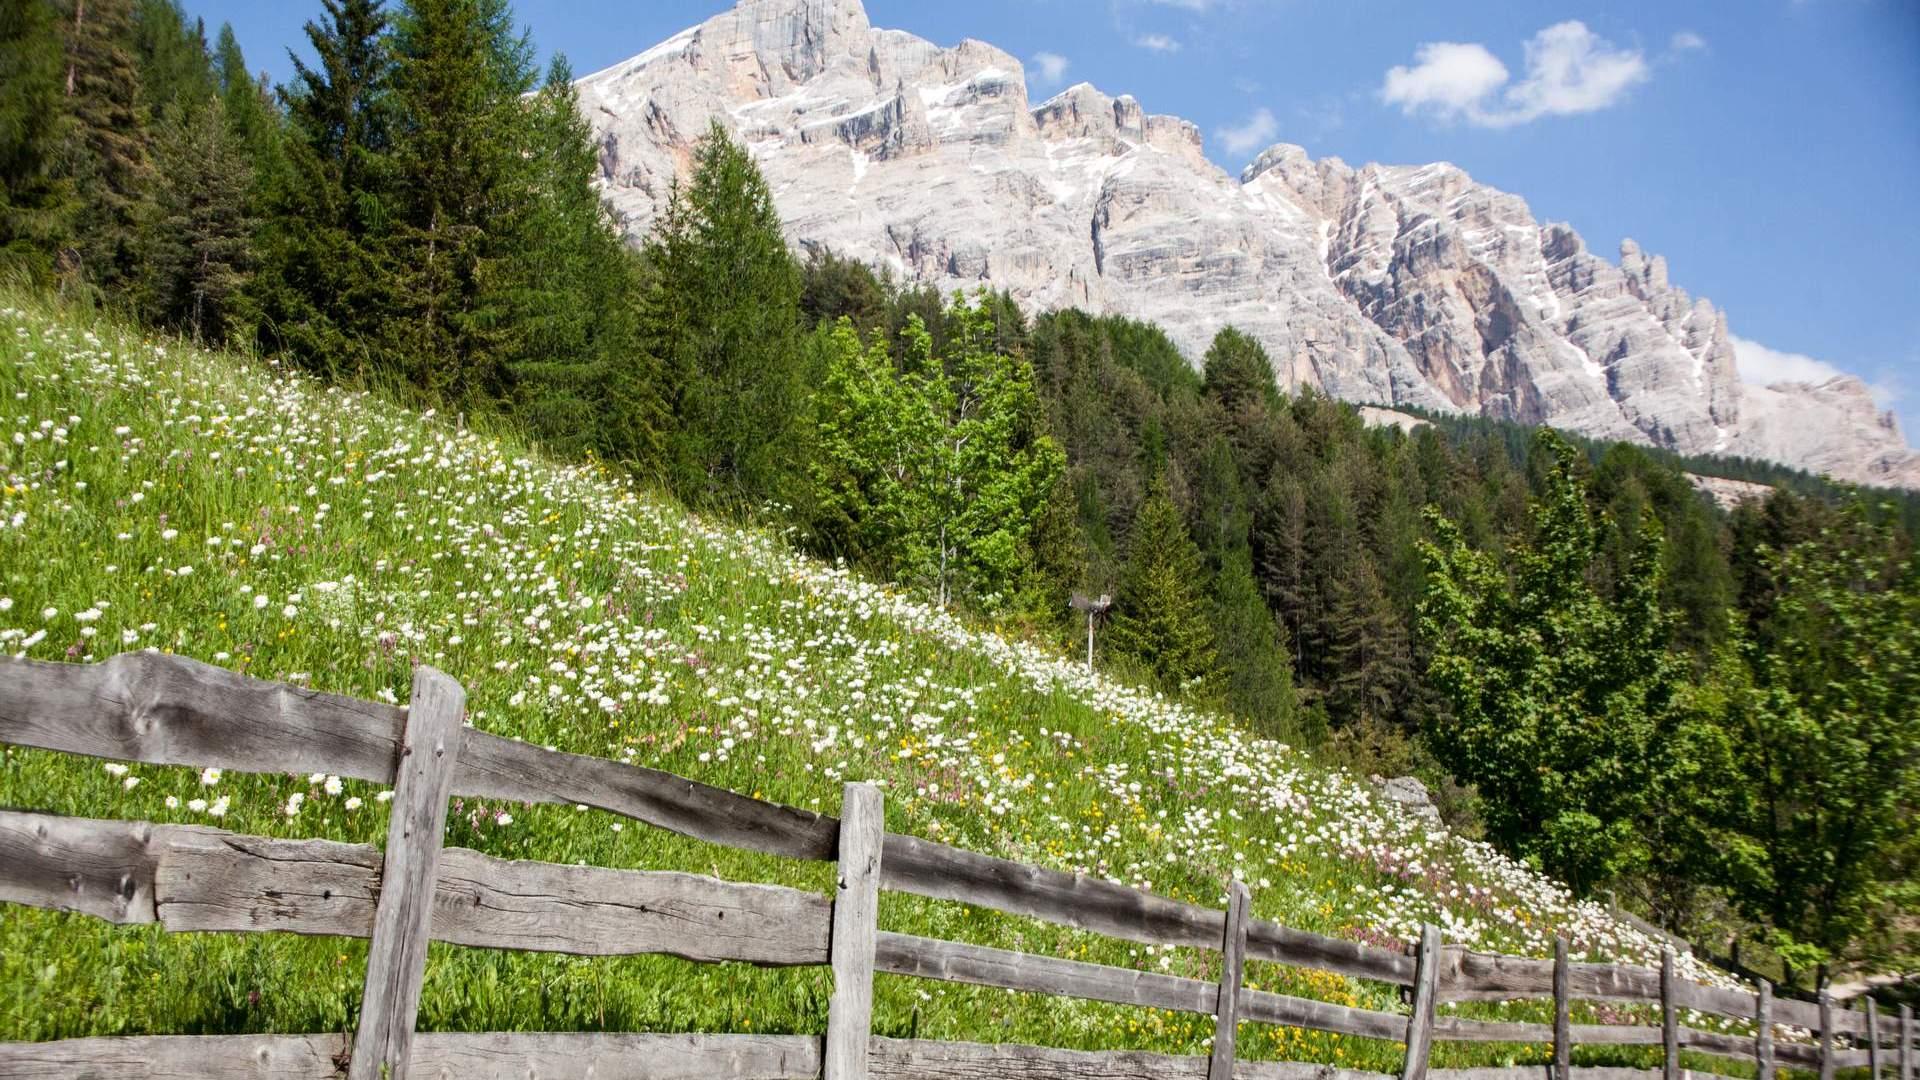 Apartments Alpine Mountain Chalet - San Vigilio in South Tyrol